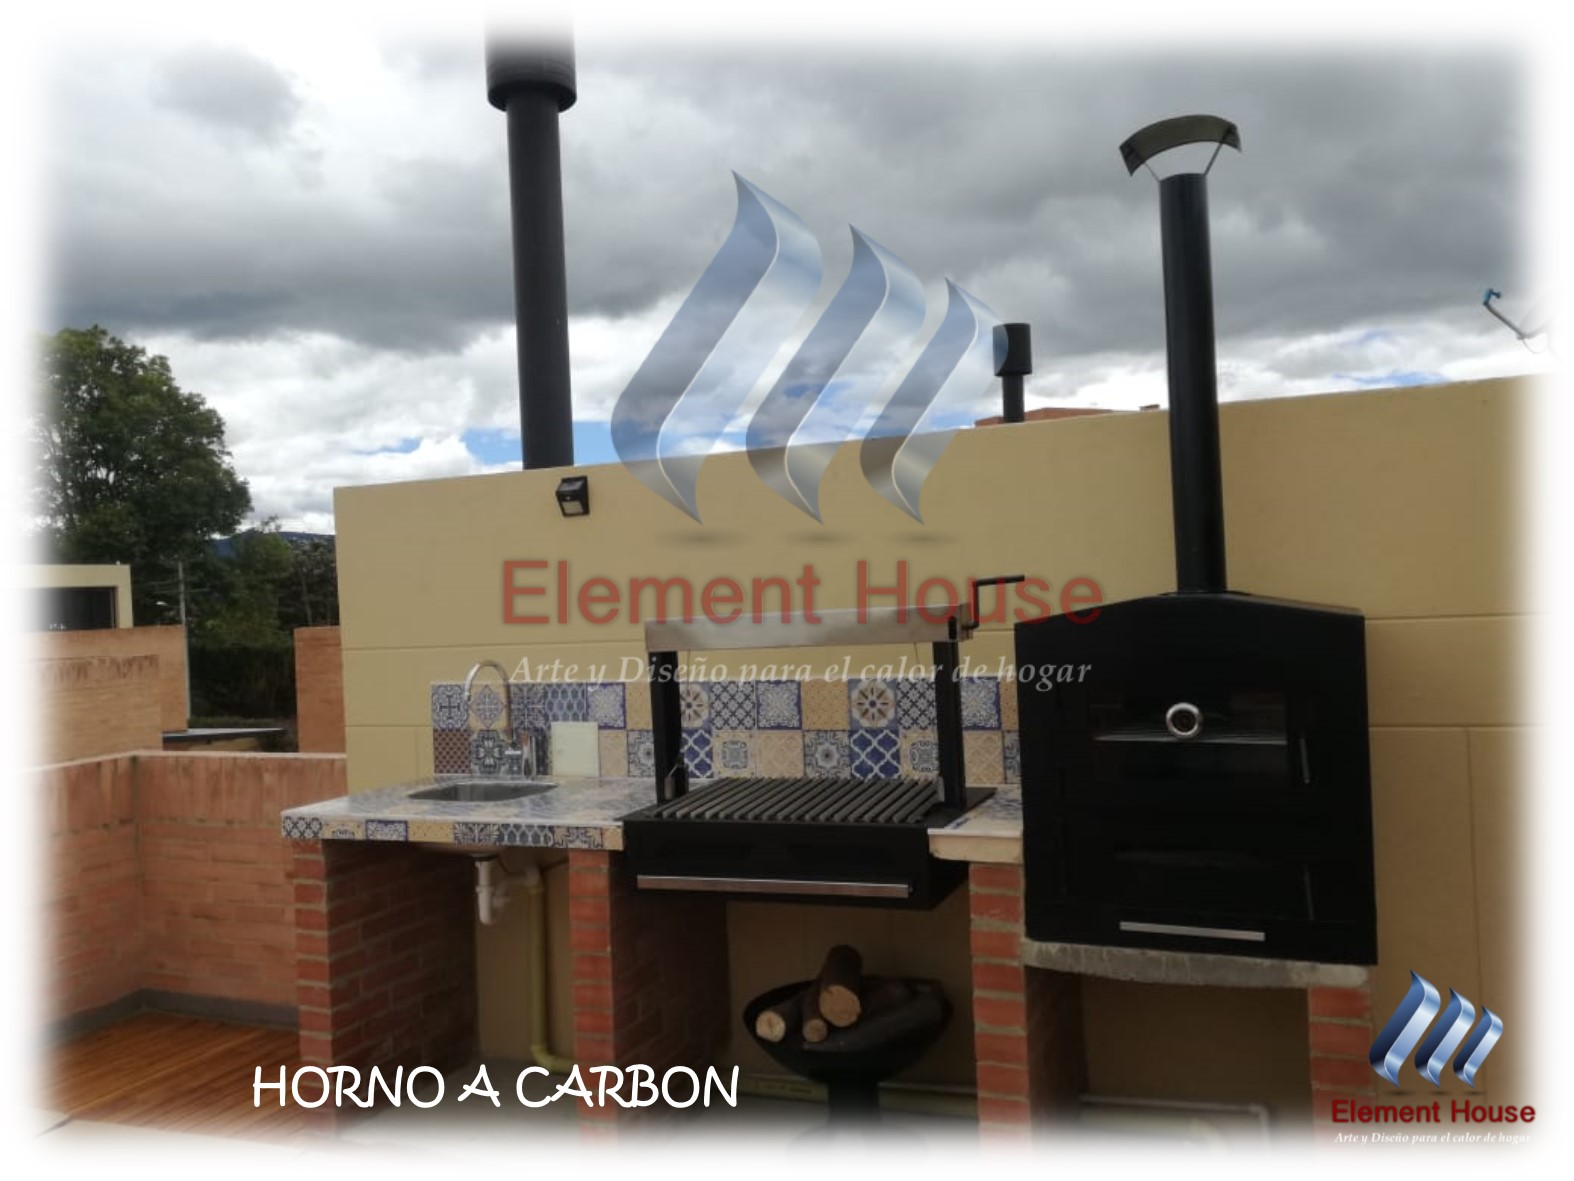 HORNO ELEMENT HOUSE 2